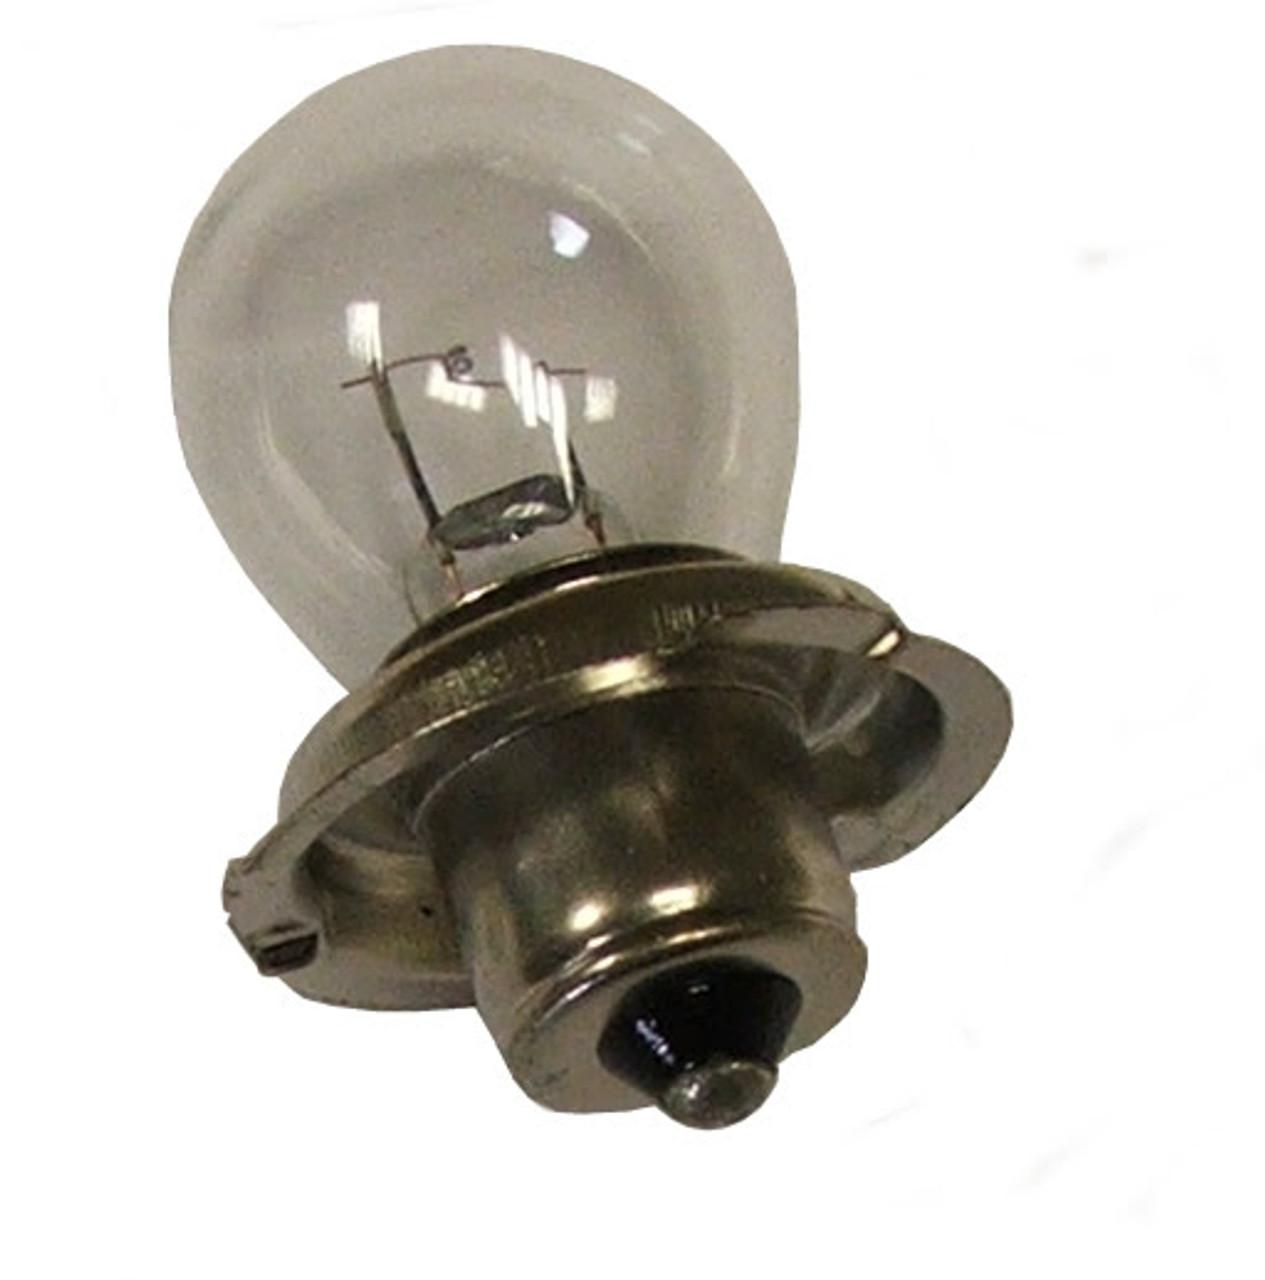 NOS Square Black CEV Headlight, Garelli Style